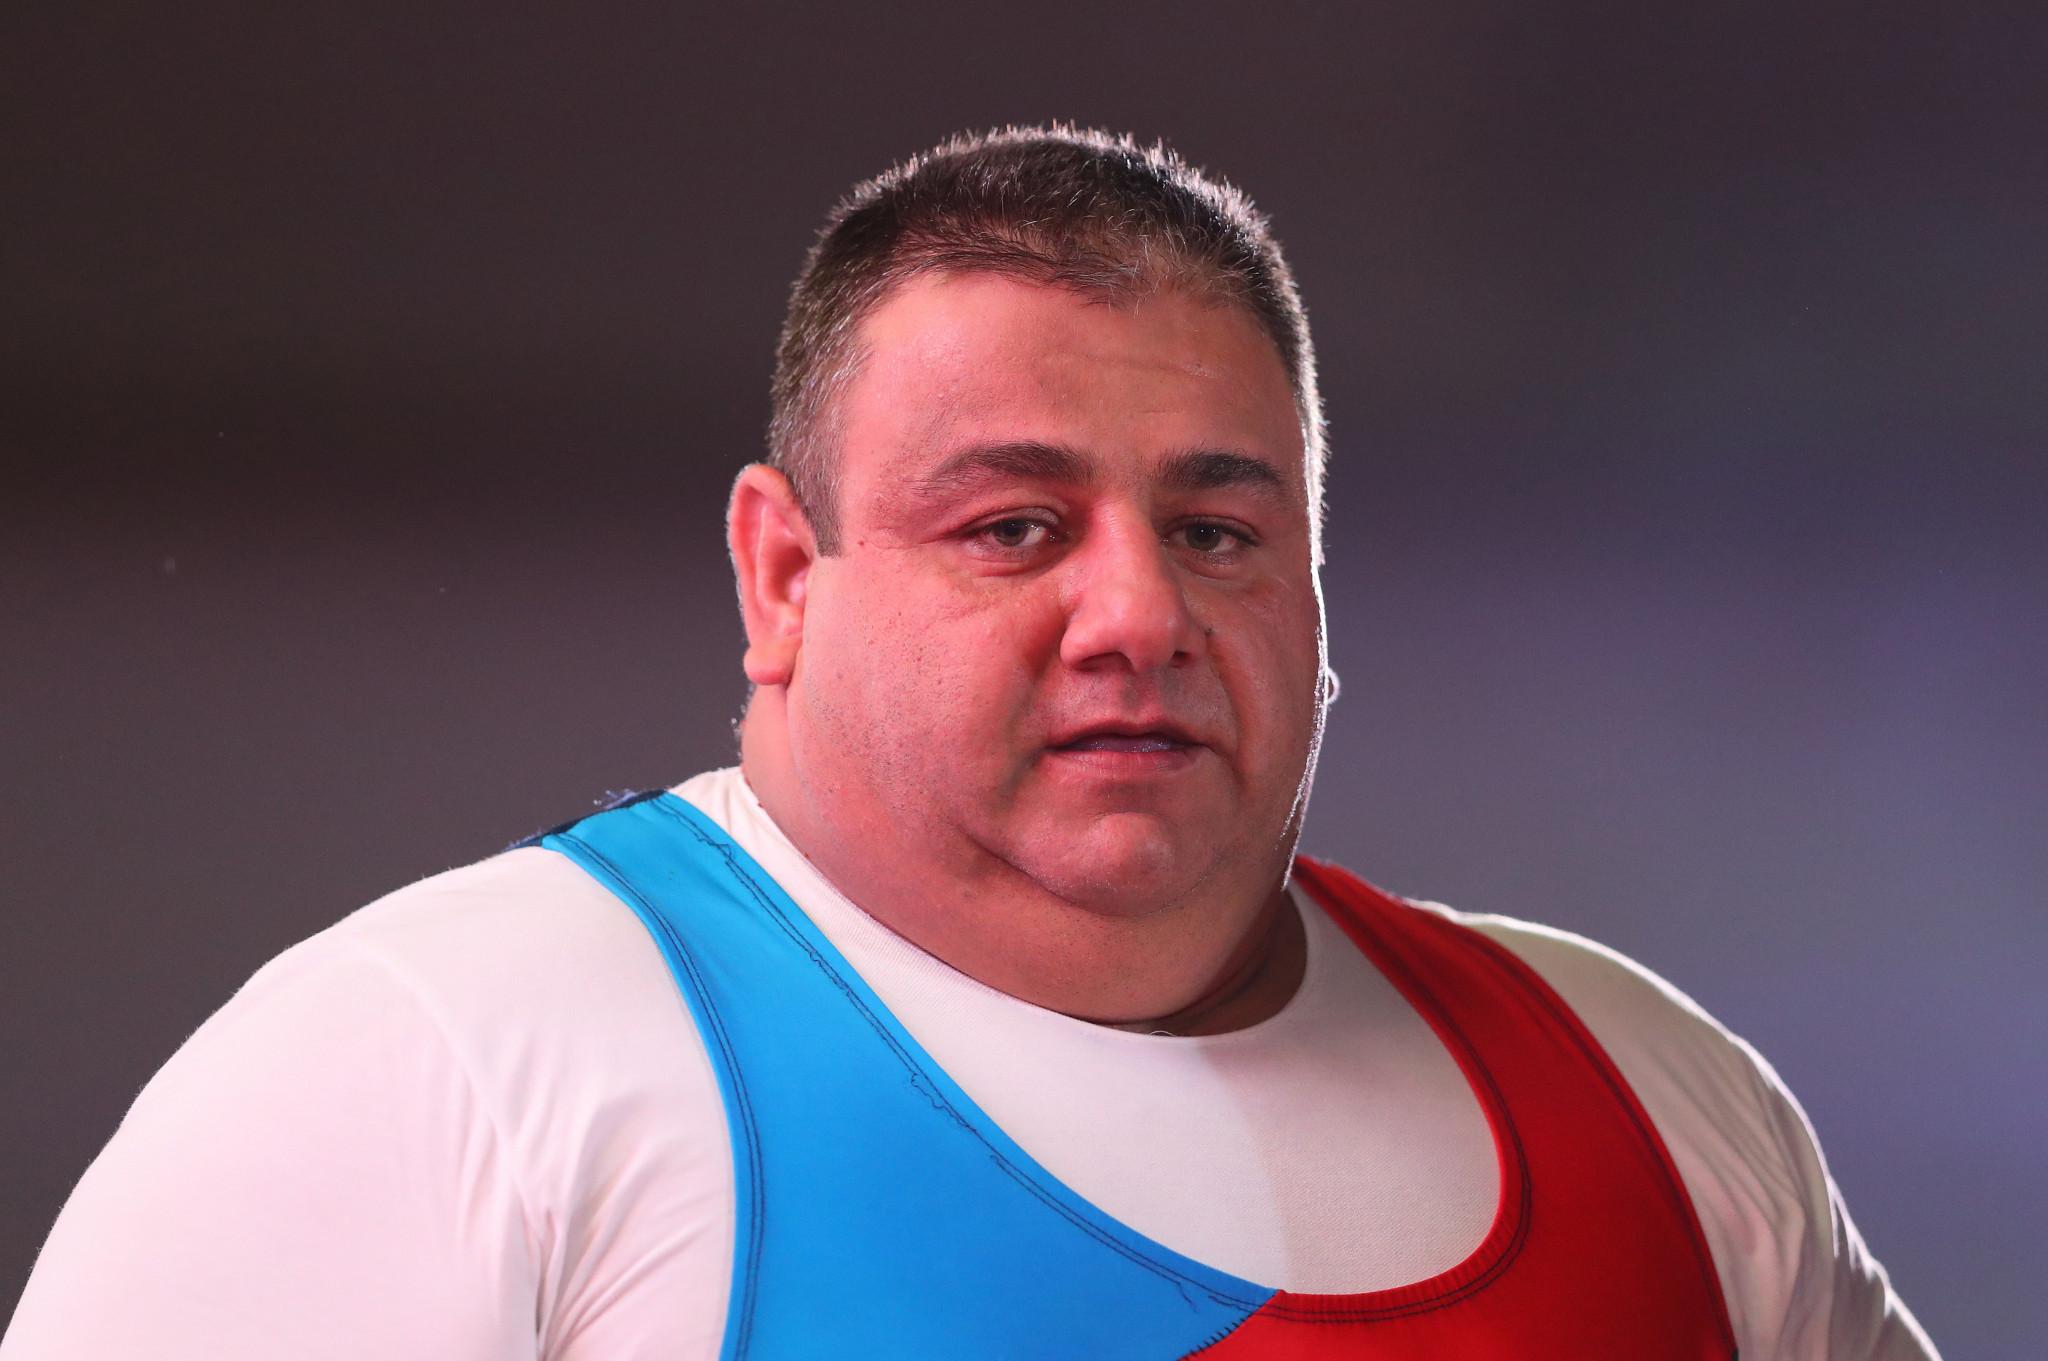 Huseynov and Aslanov earn Azerbaijani gold medals at Para Powerlifting World Cup